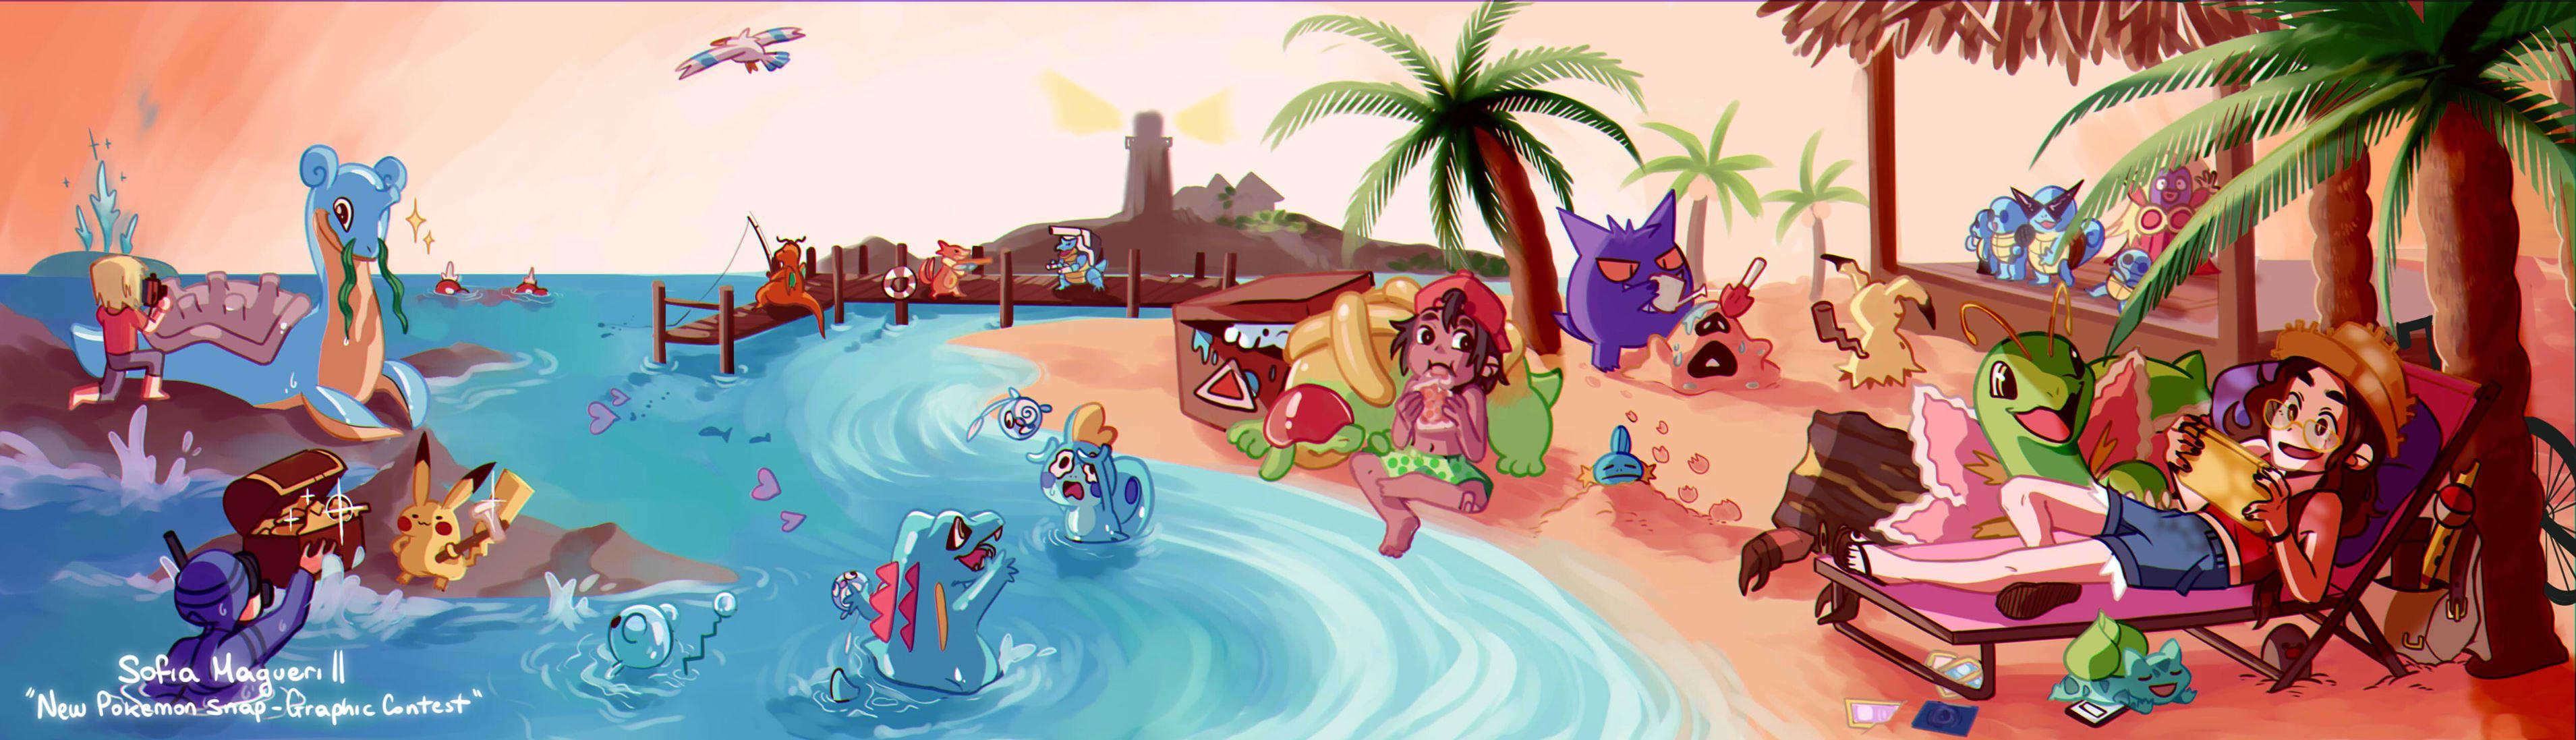 Sofia Magueri II - New Pokémon Snap Graphic Contest